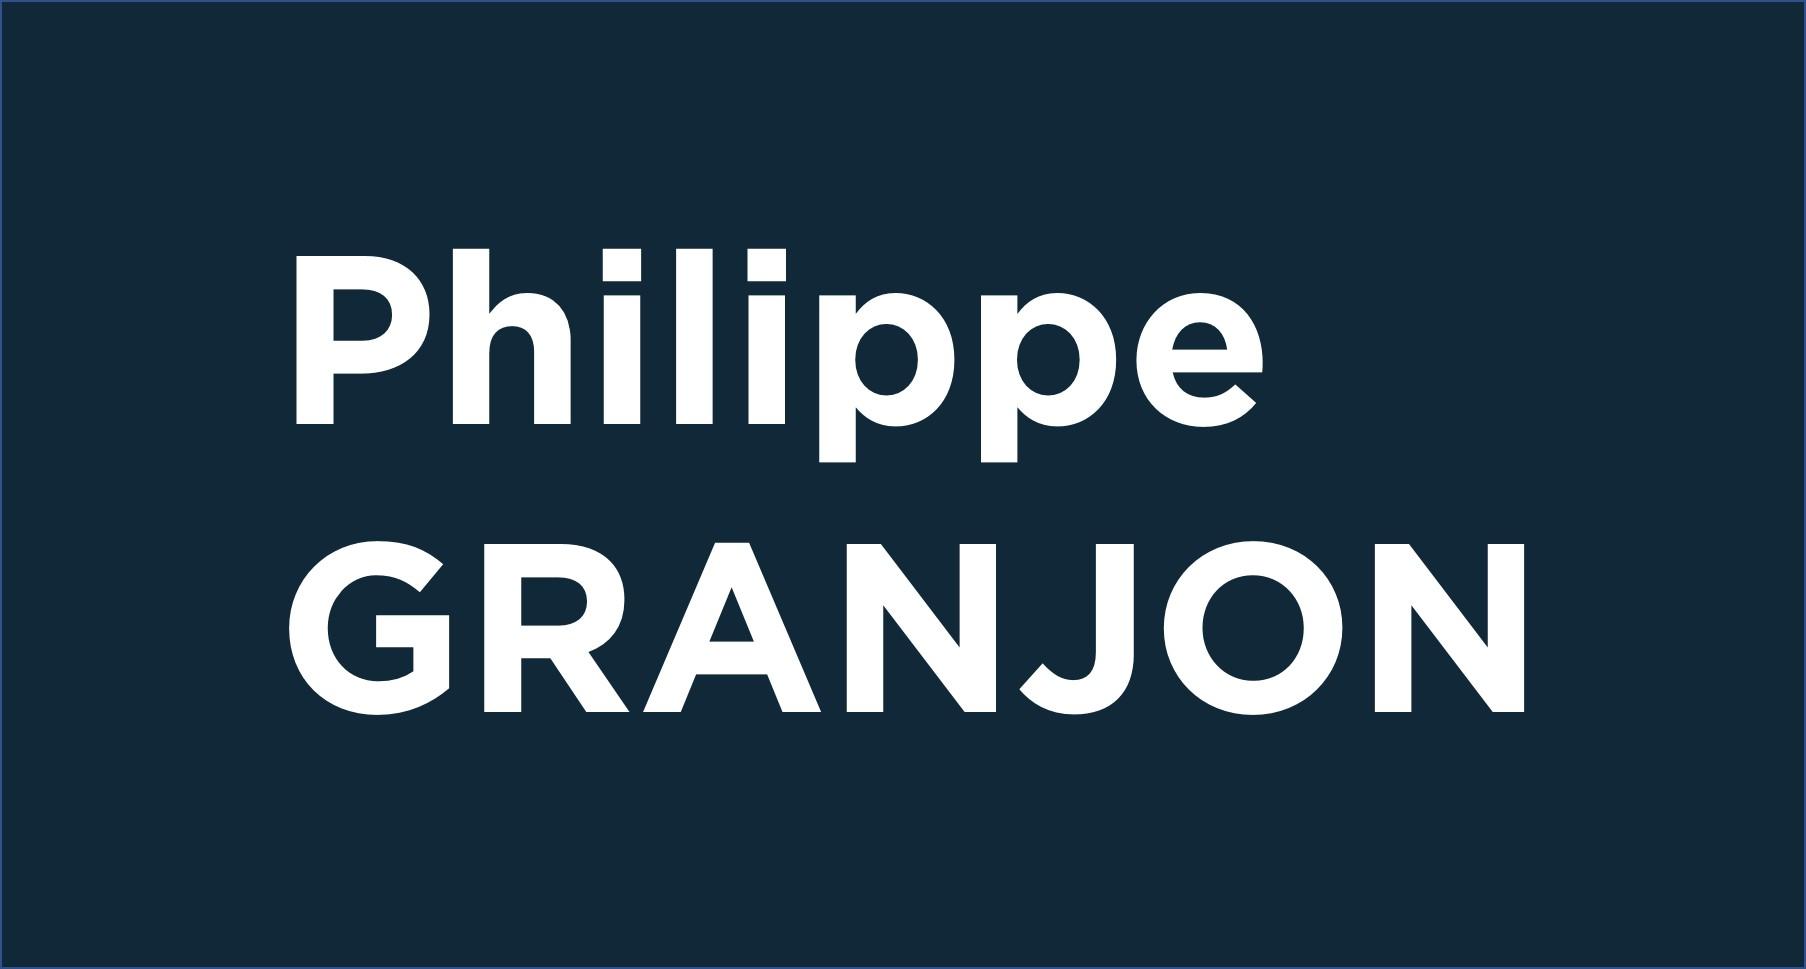 Philippe Granjon